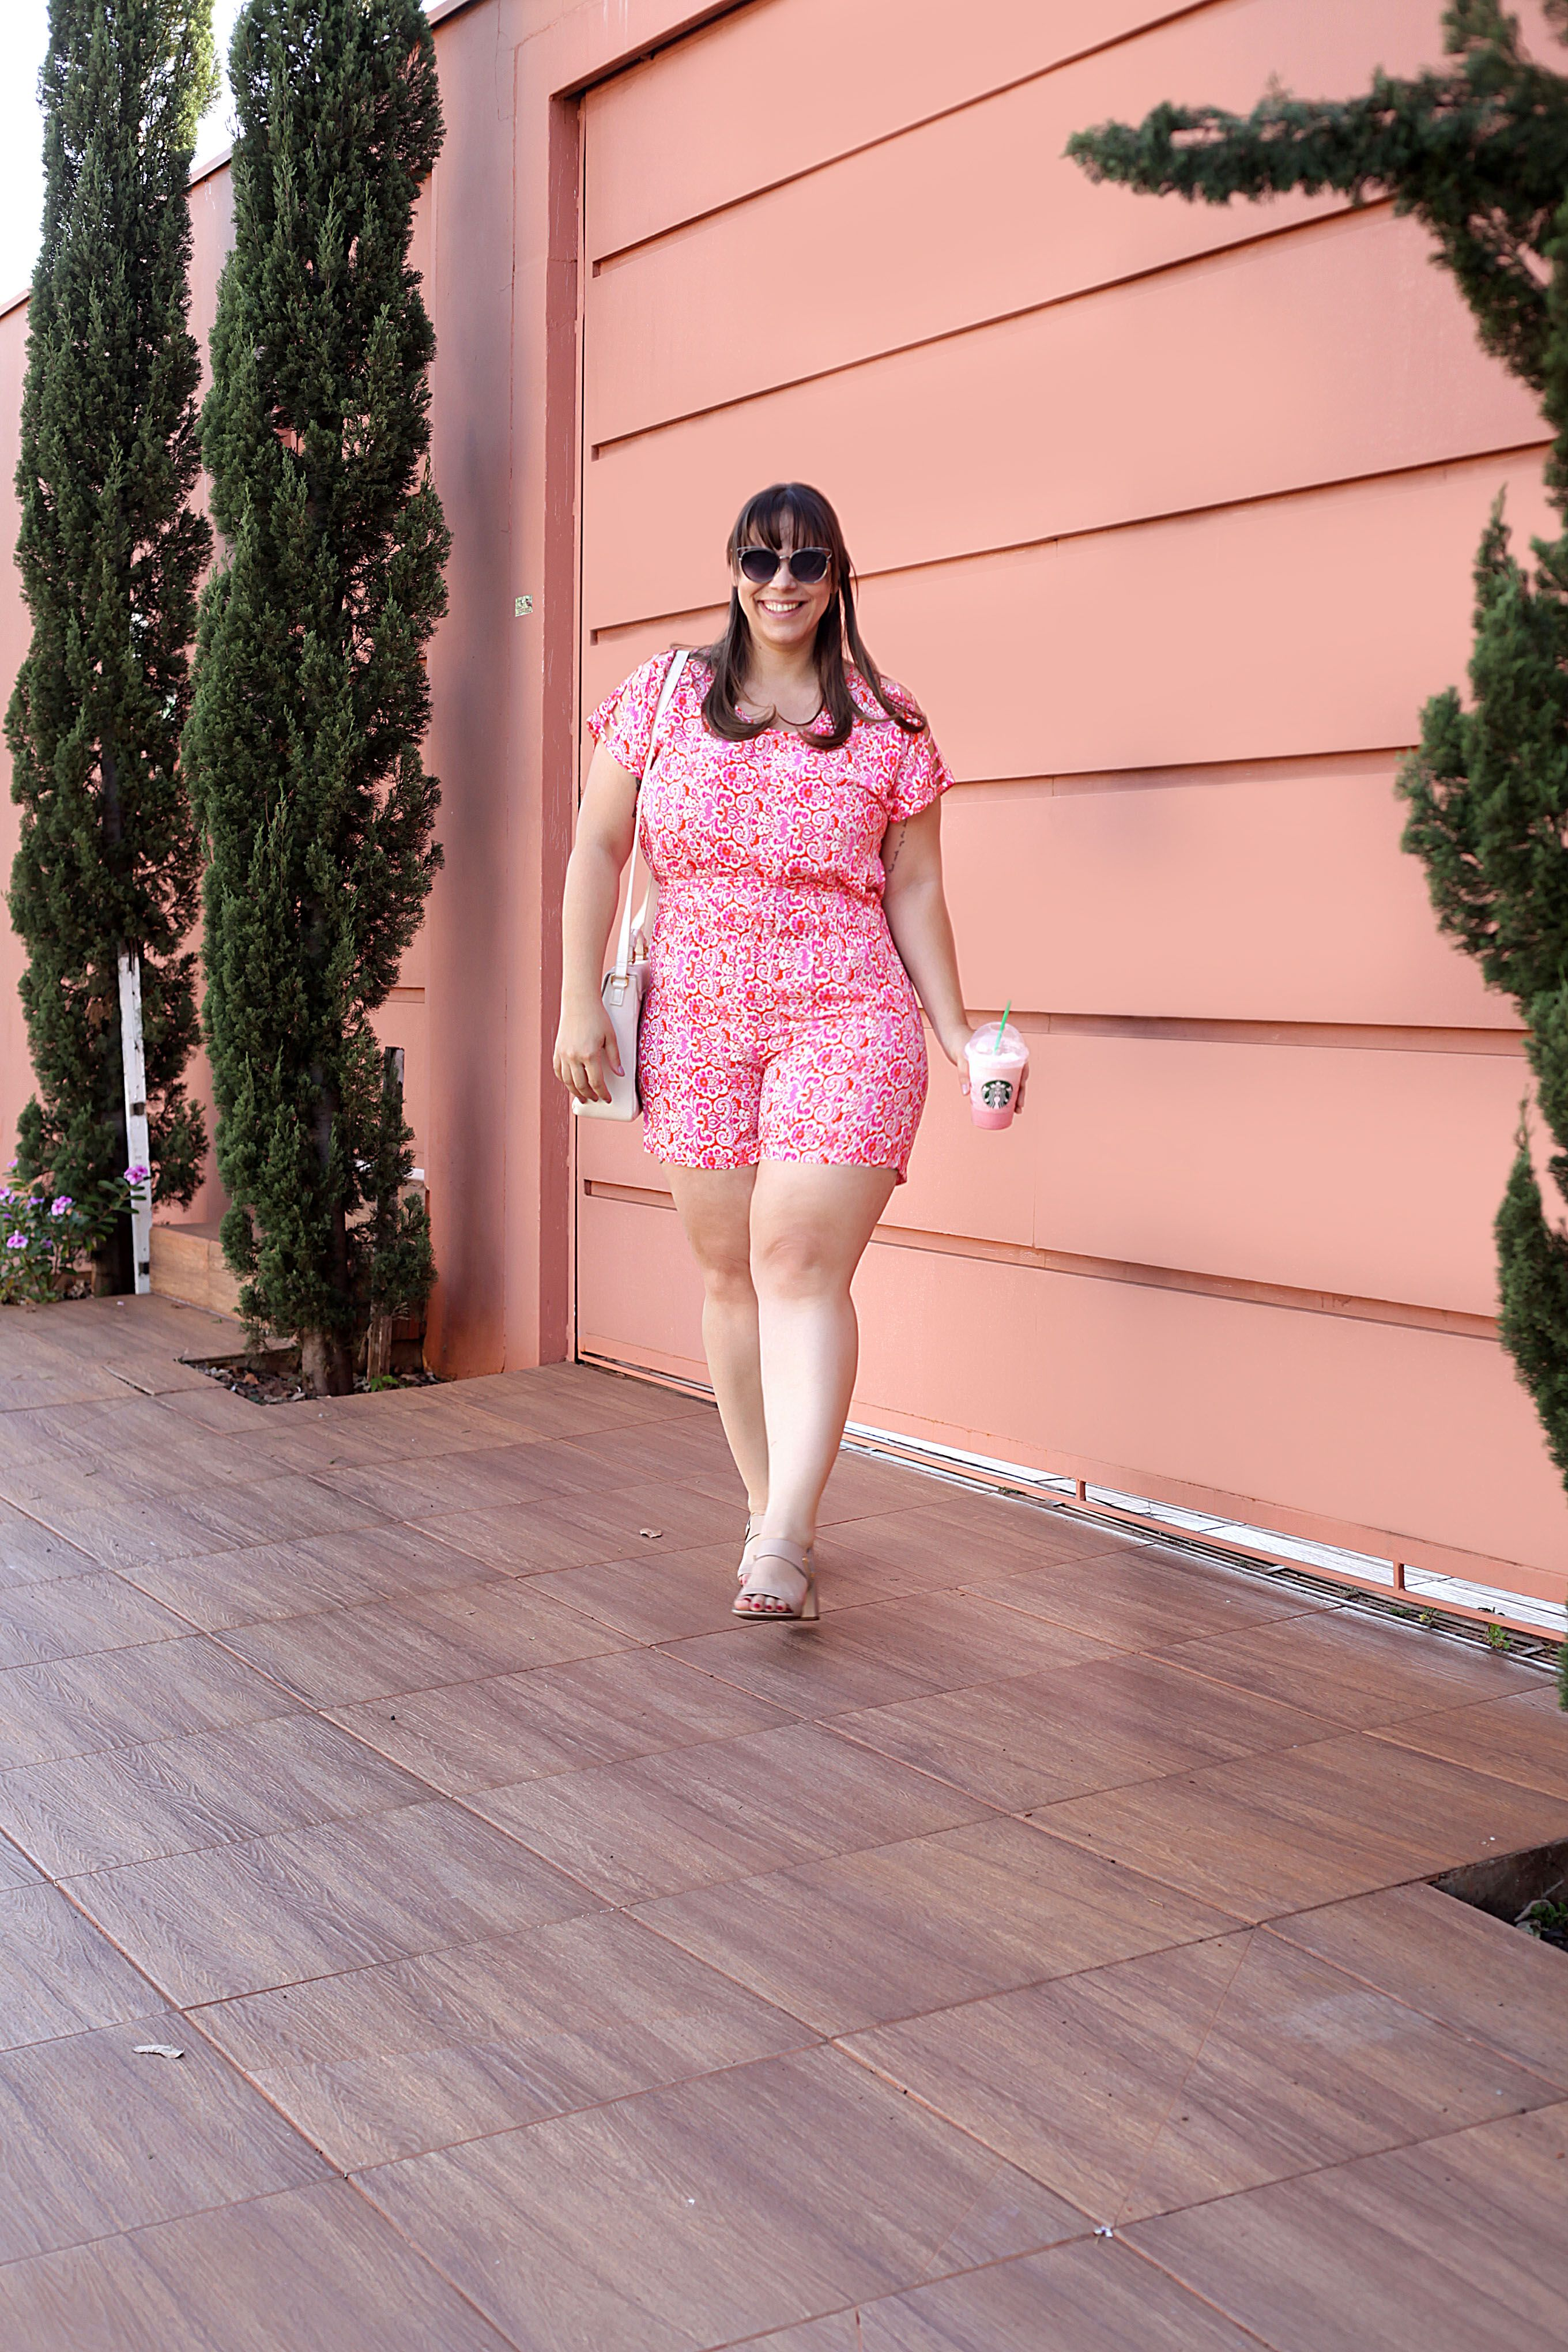 Plus Size Fashion  Blogger: Na Clementin  #moda #plussize #fashion #plussizeblogger #modaplussize #gg #fashionblogger #naclementin #plus #size #fashion #modagg #grande #blogger #blogueira #blog